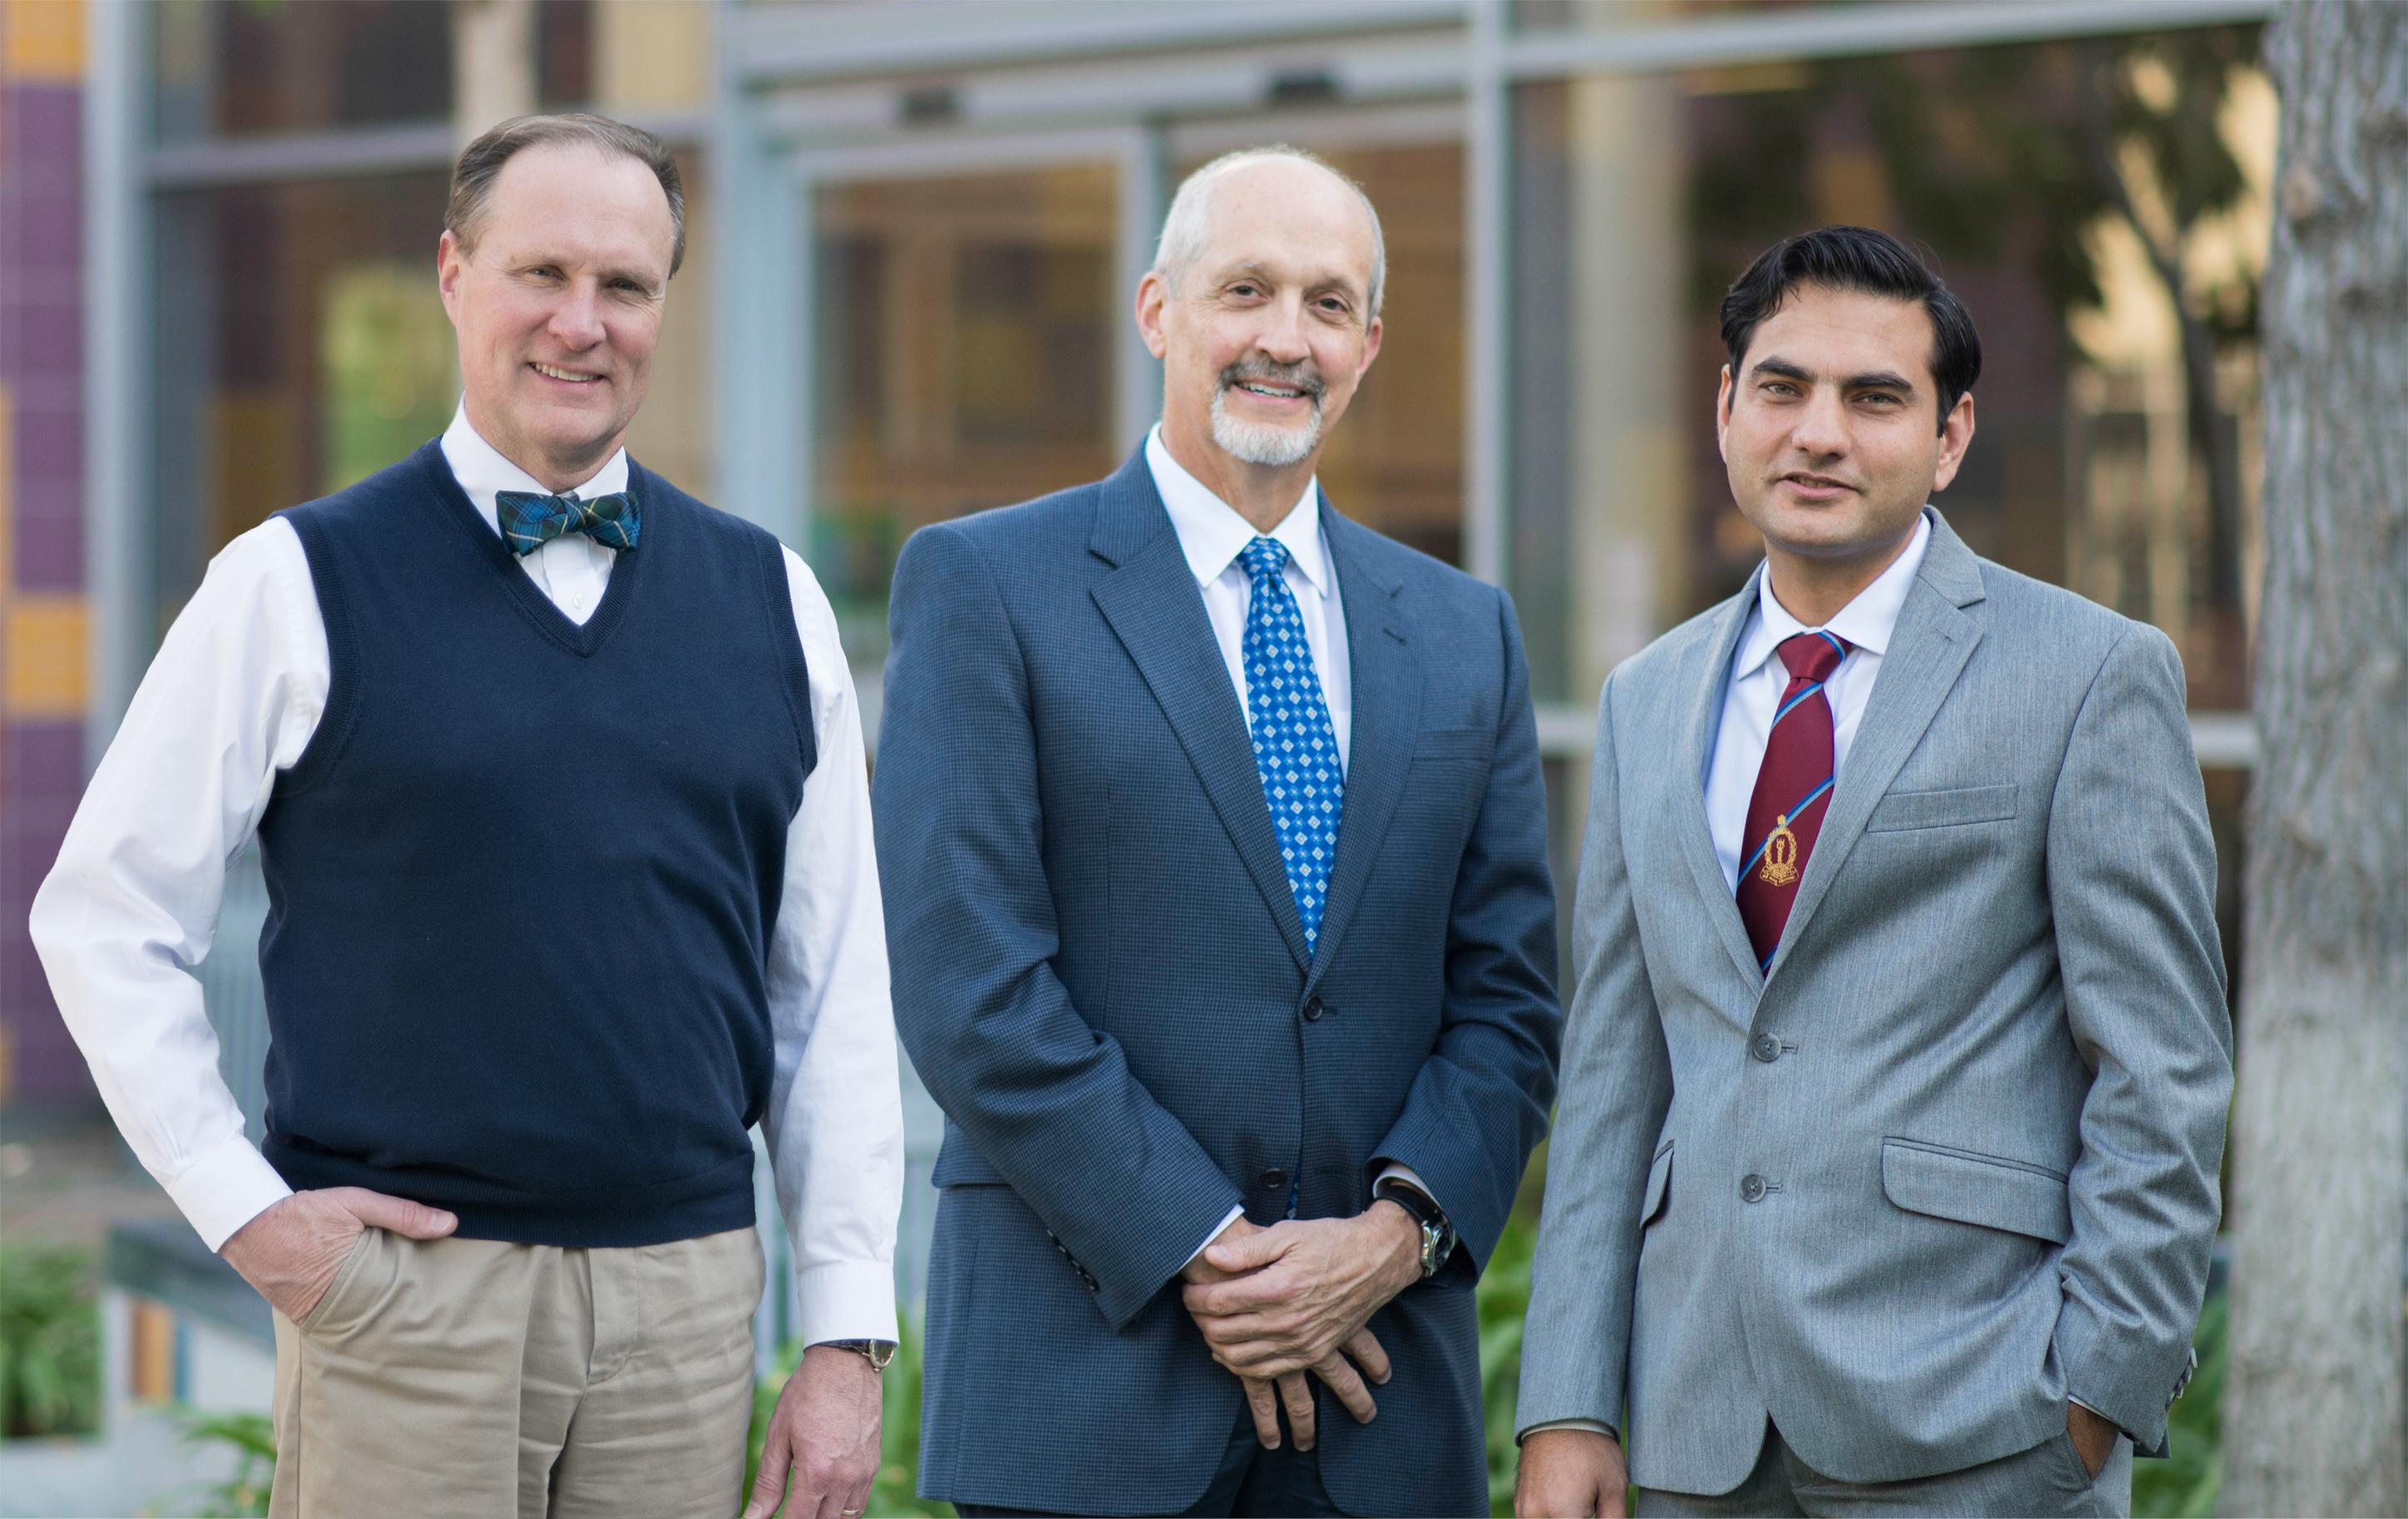 APS-Doctors-2018-Nordli-Shaddy-Kohli-hires